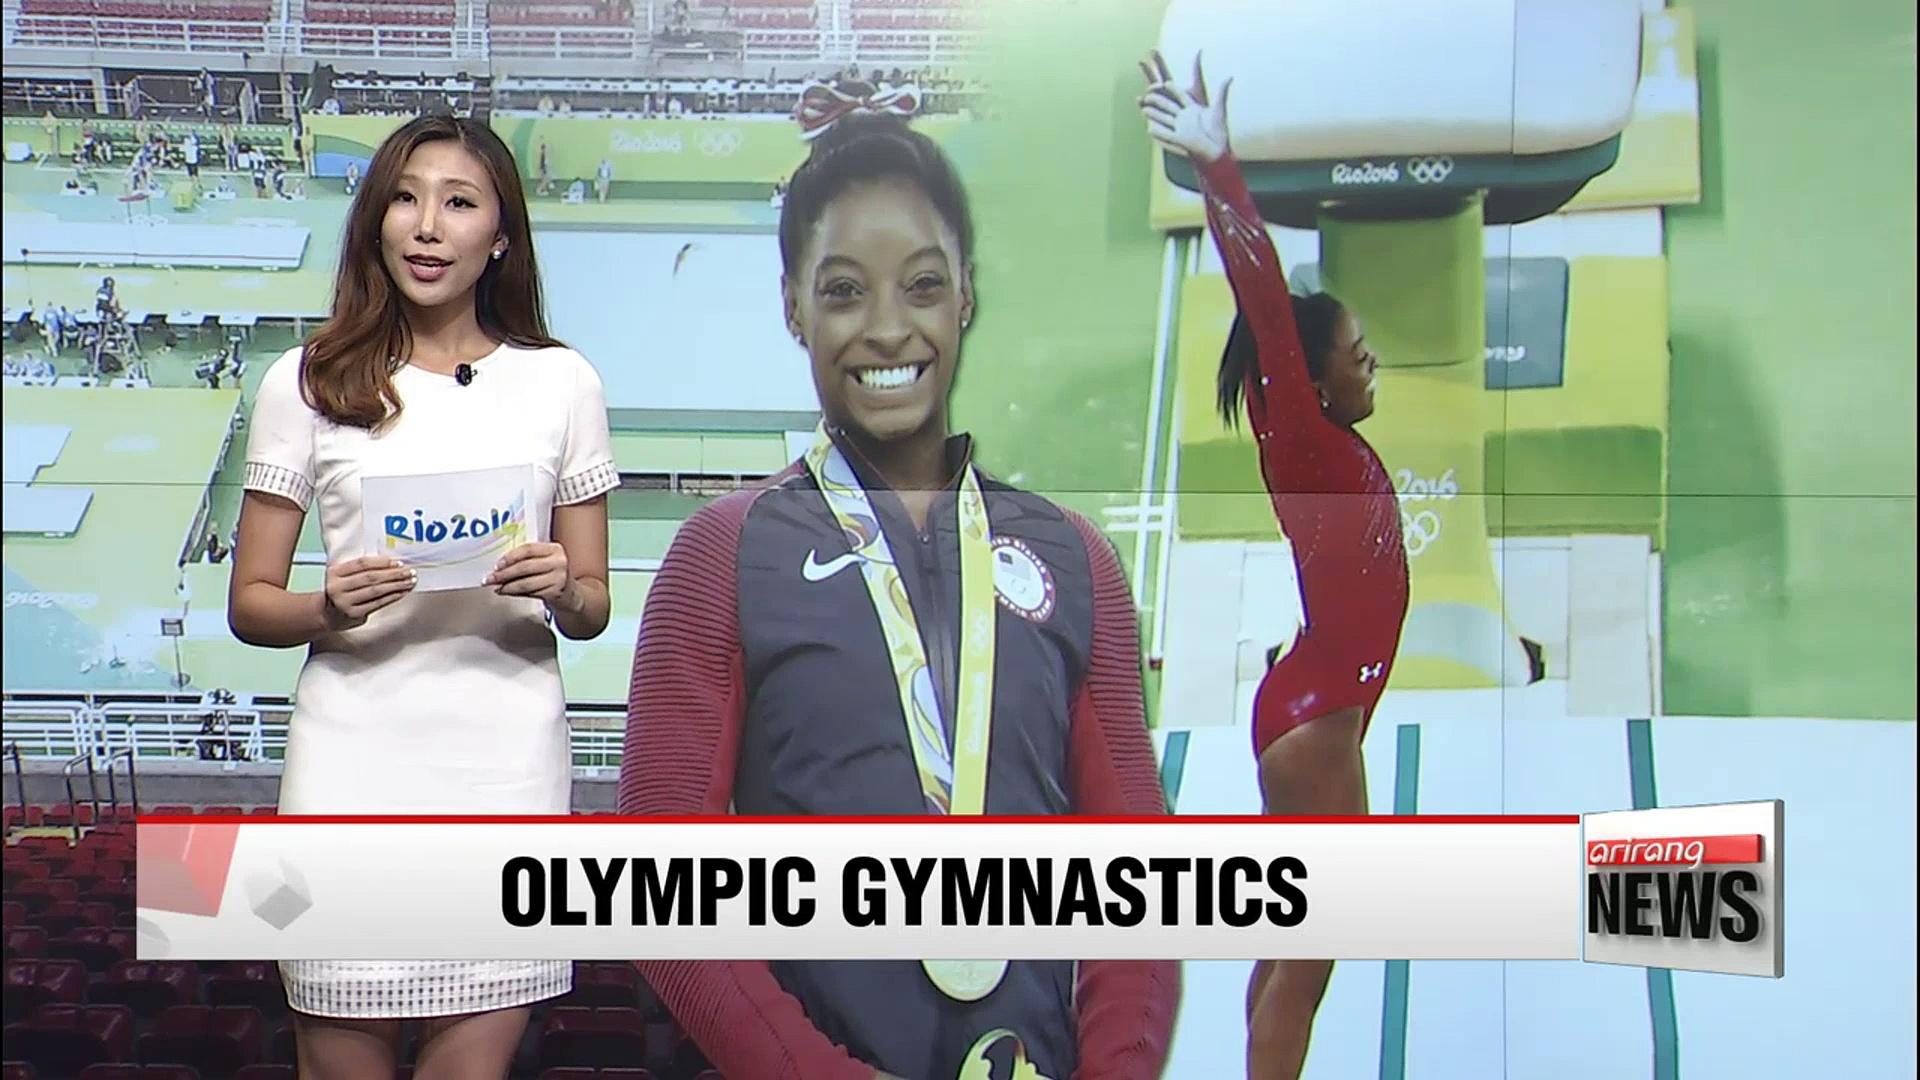 Rio 2016: U.S. gymnast Simone Biles wins 3rd gold in women's vault